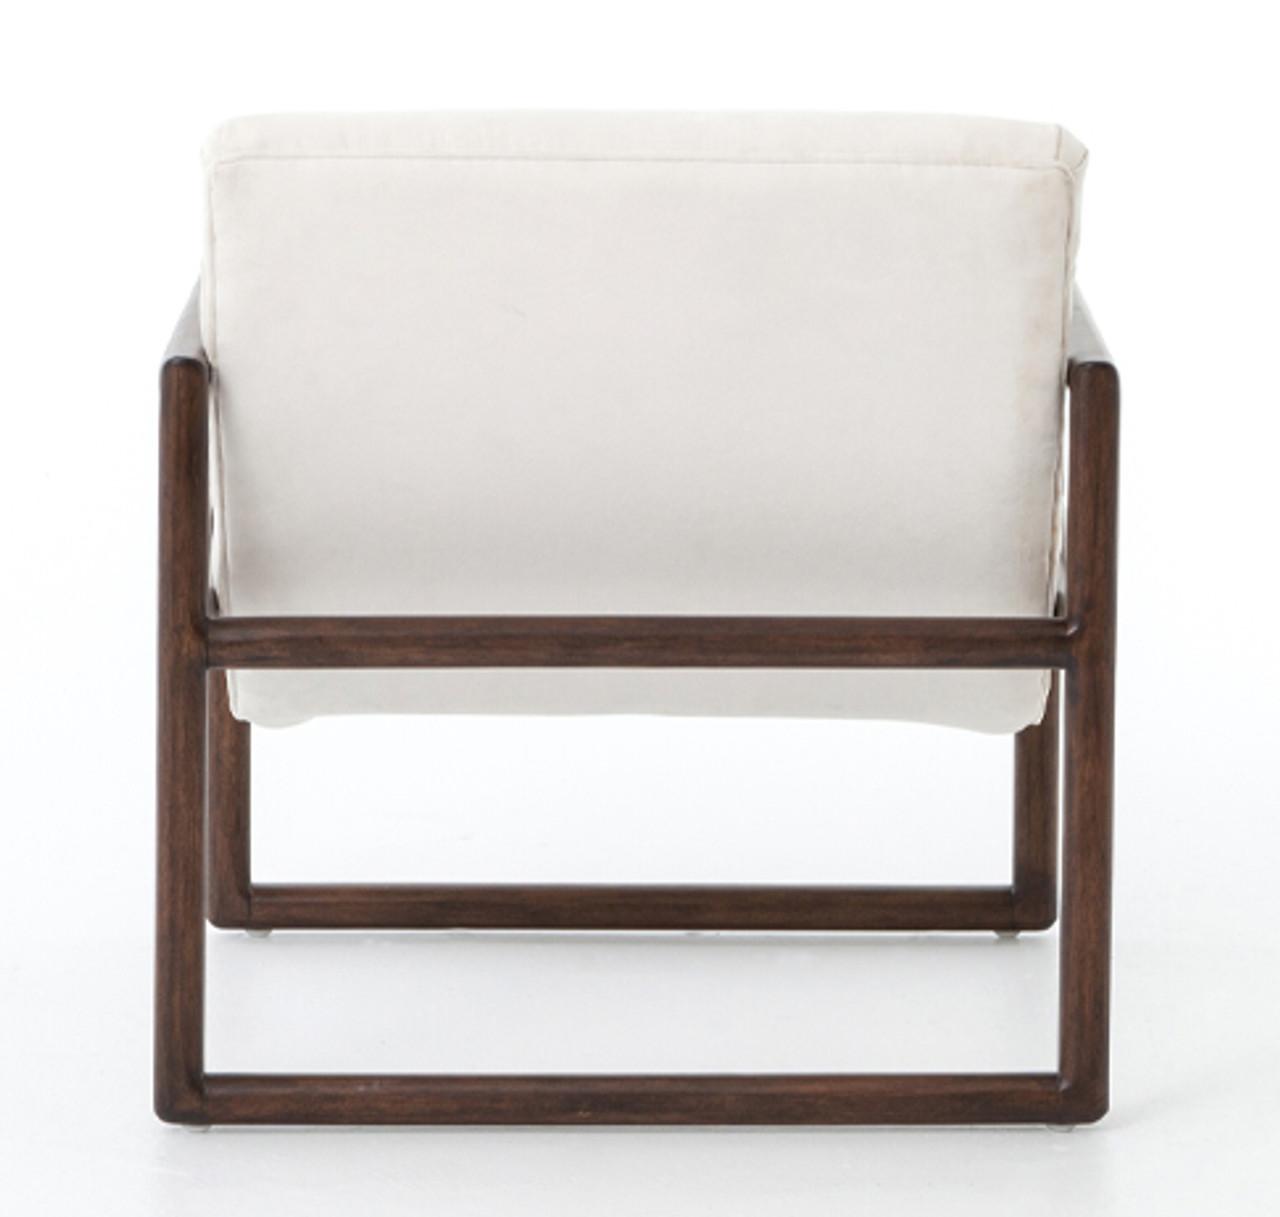 Brava Curved Lounge Chair